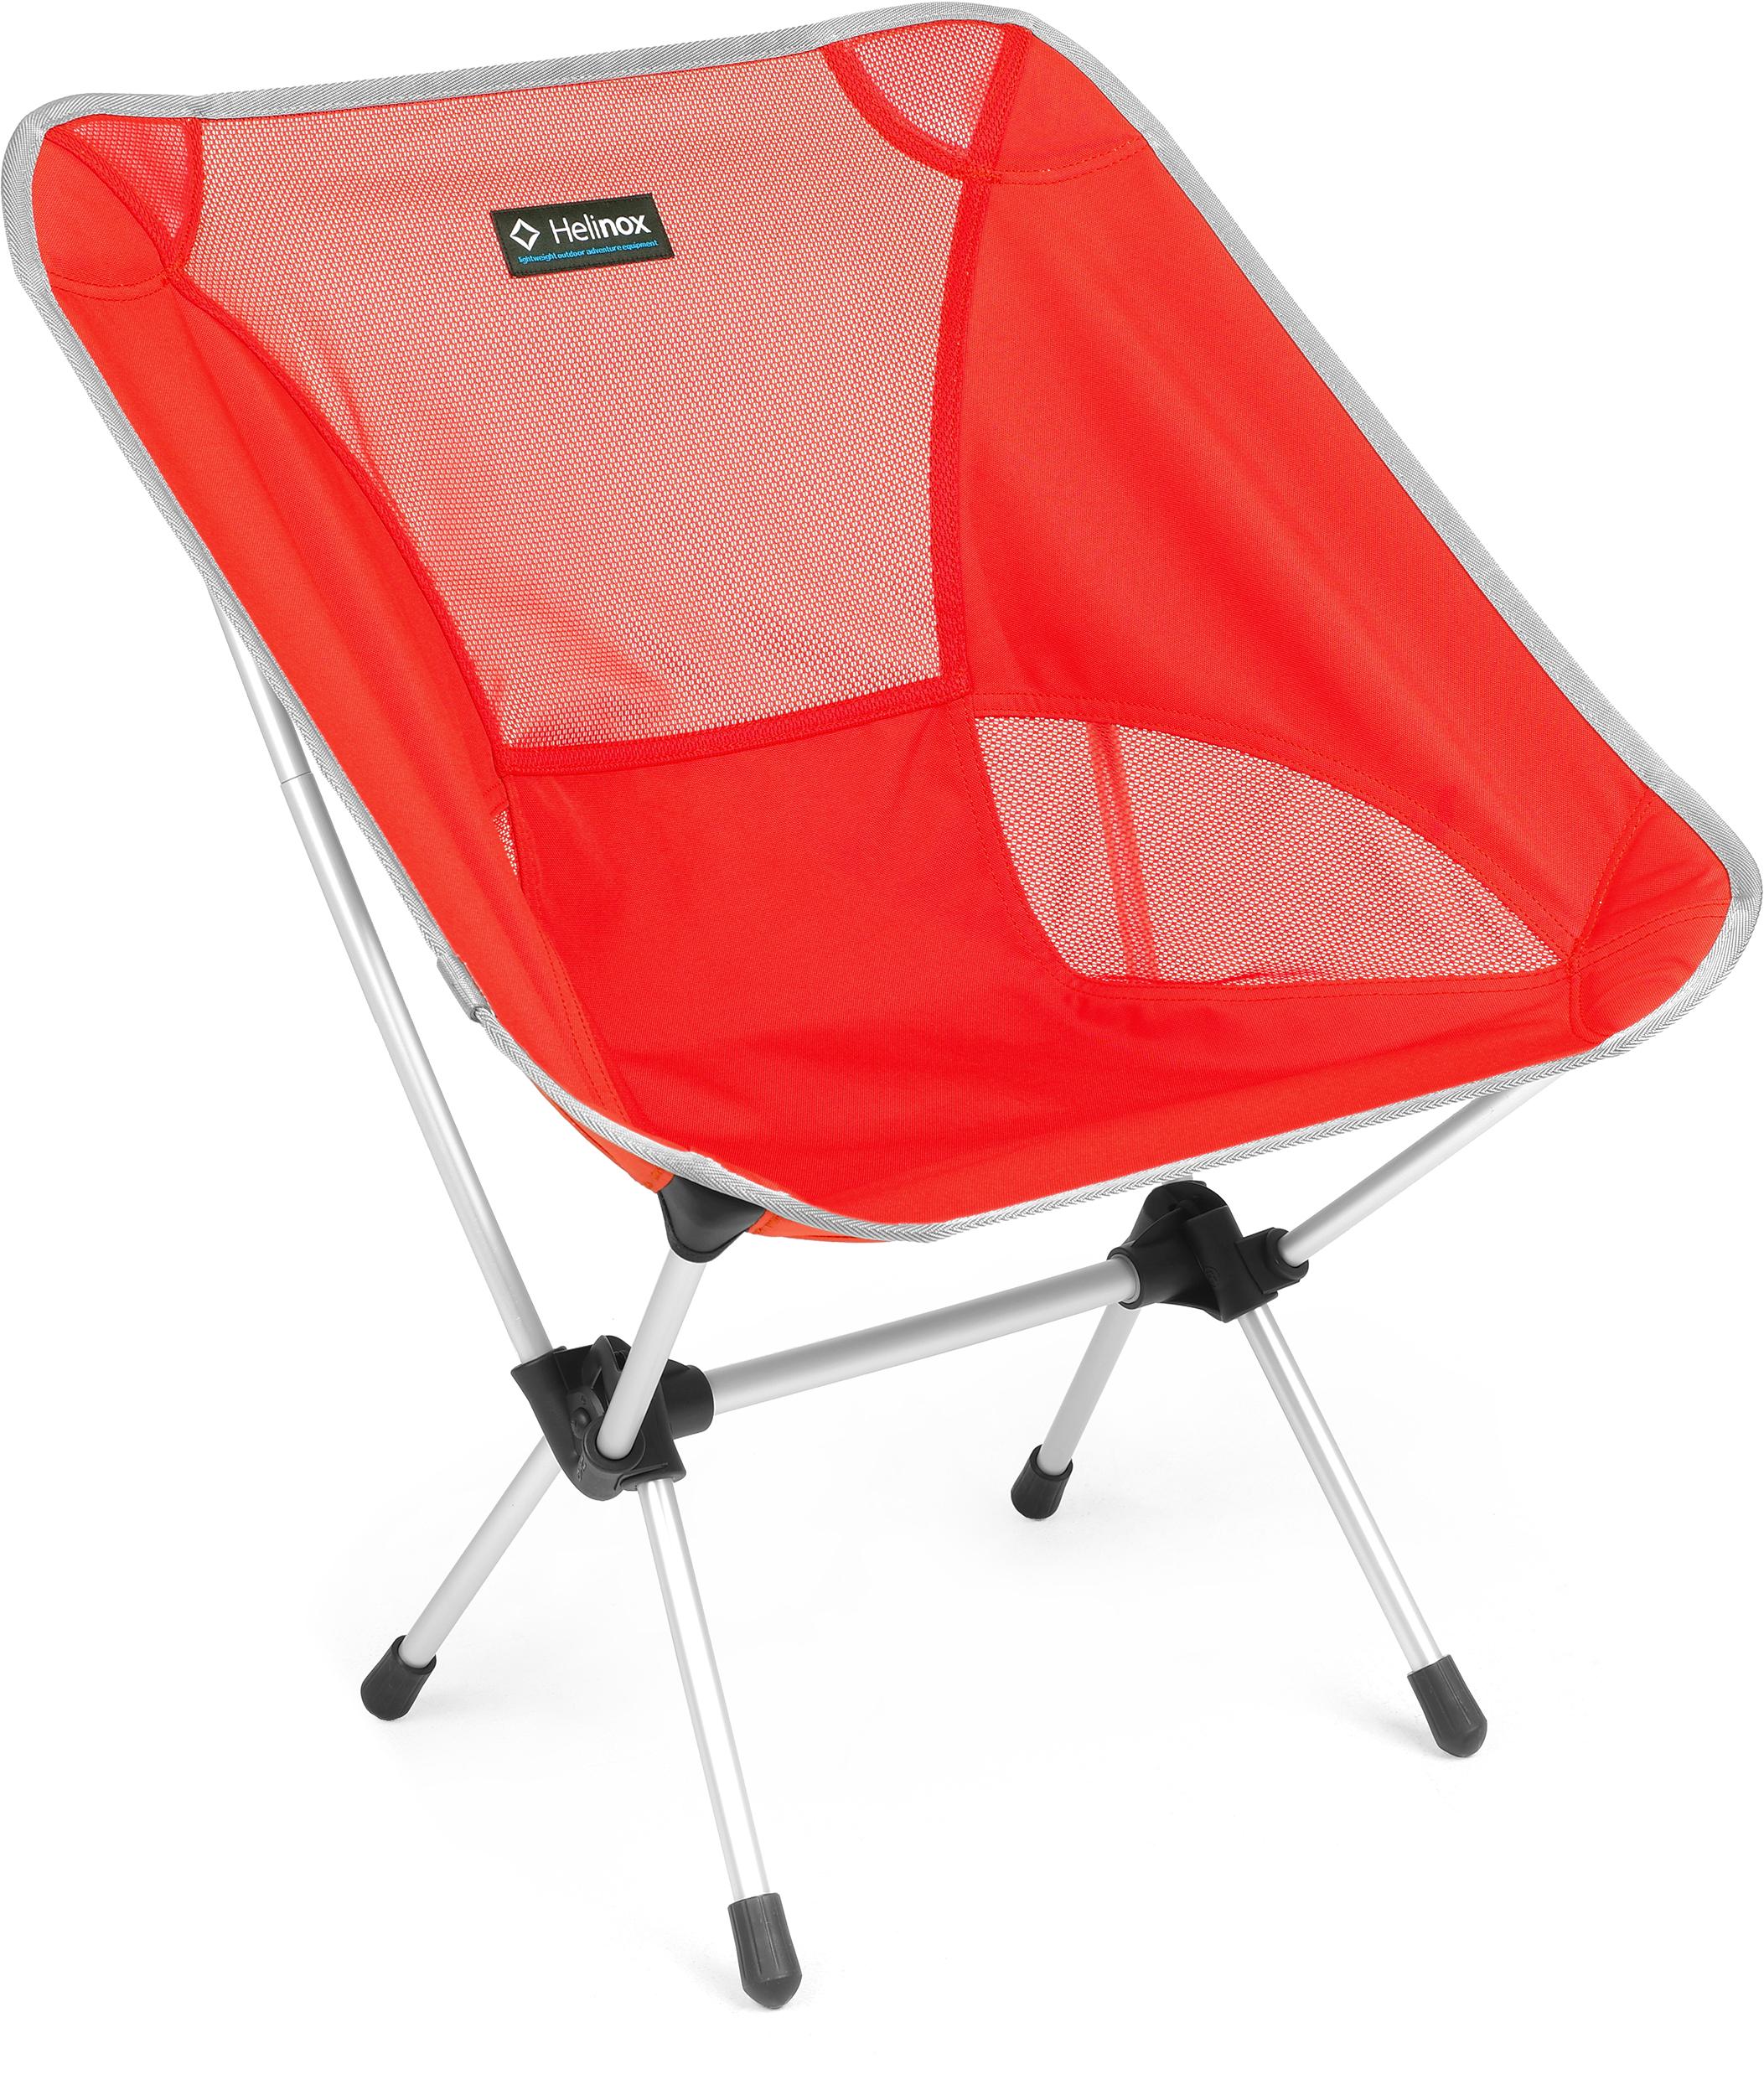 Groovy Camping Chairs Mec Frankydiablos Diy Chair Ideas Frankydiabloscom